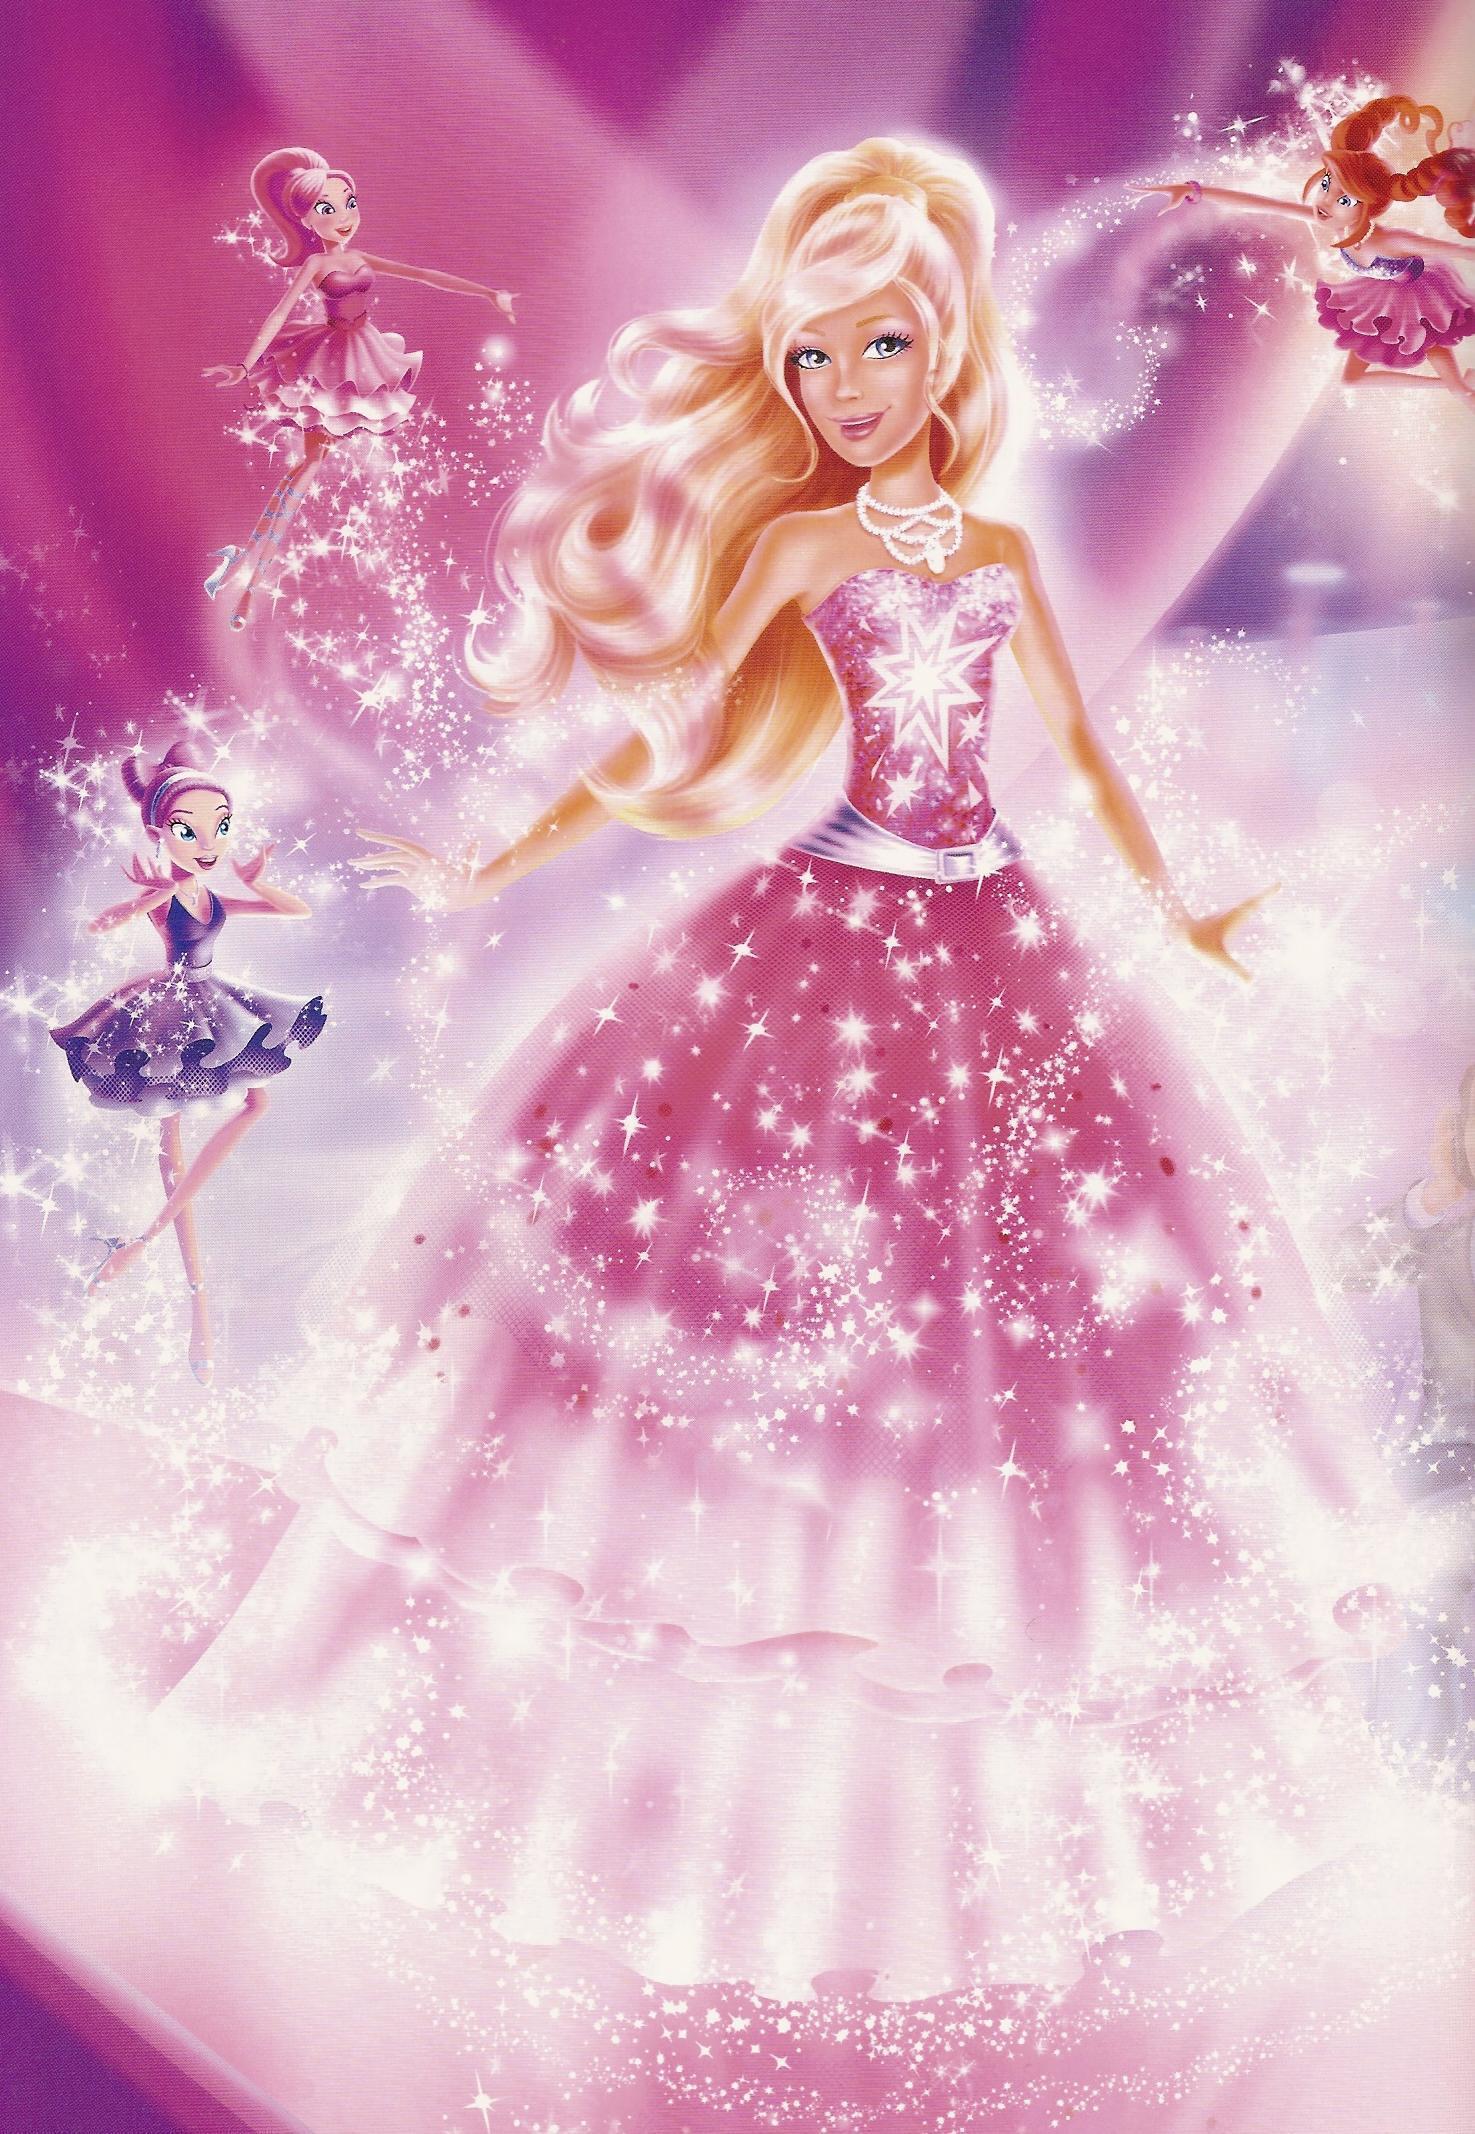 Uncategorized Barbie A Fashion Fairytale barbie fashion fairytale images a hd wallpaper and background photos